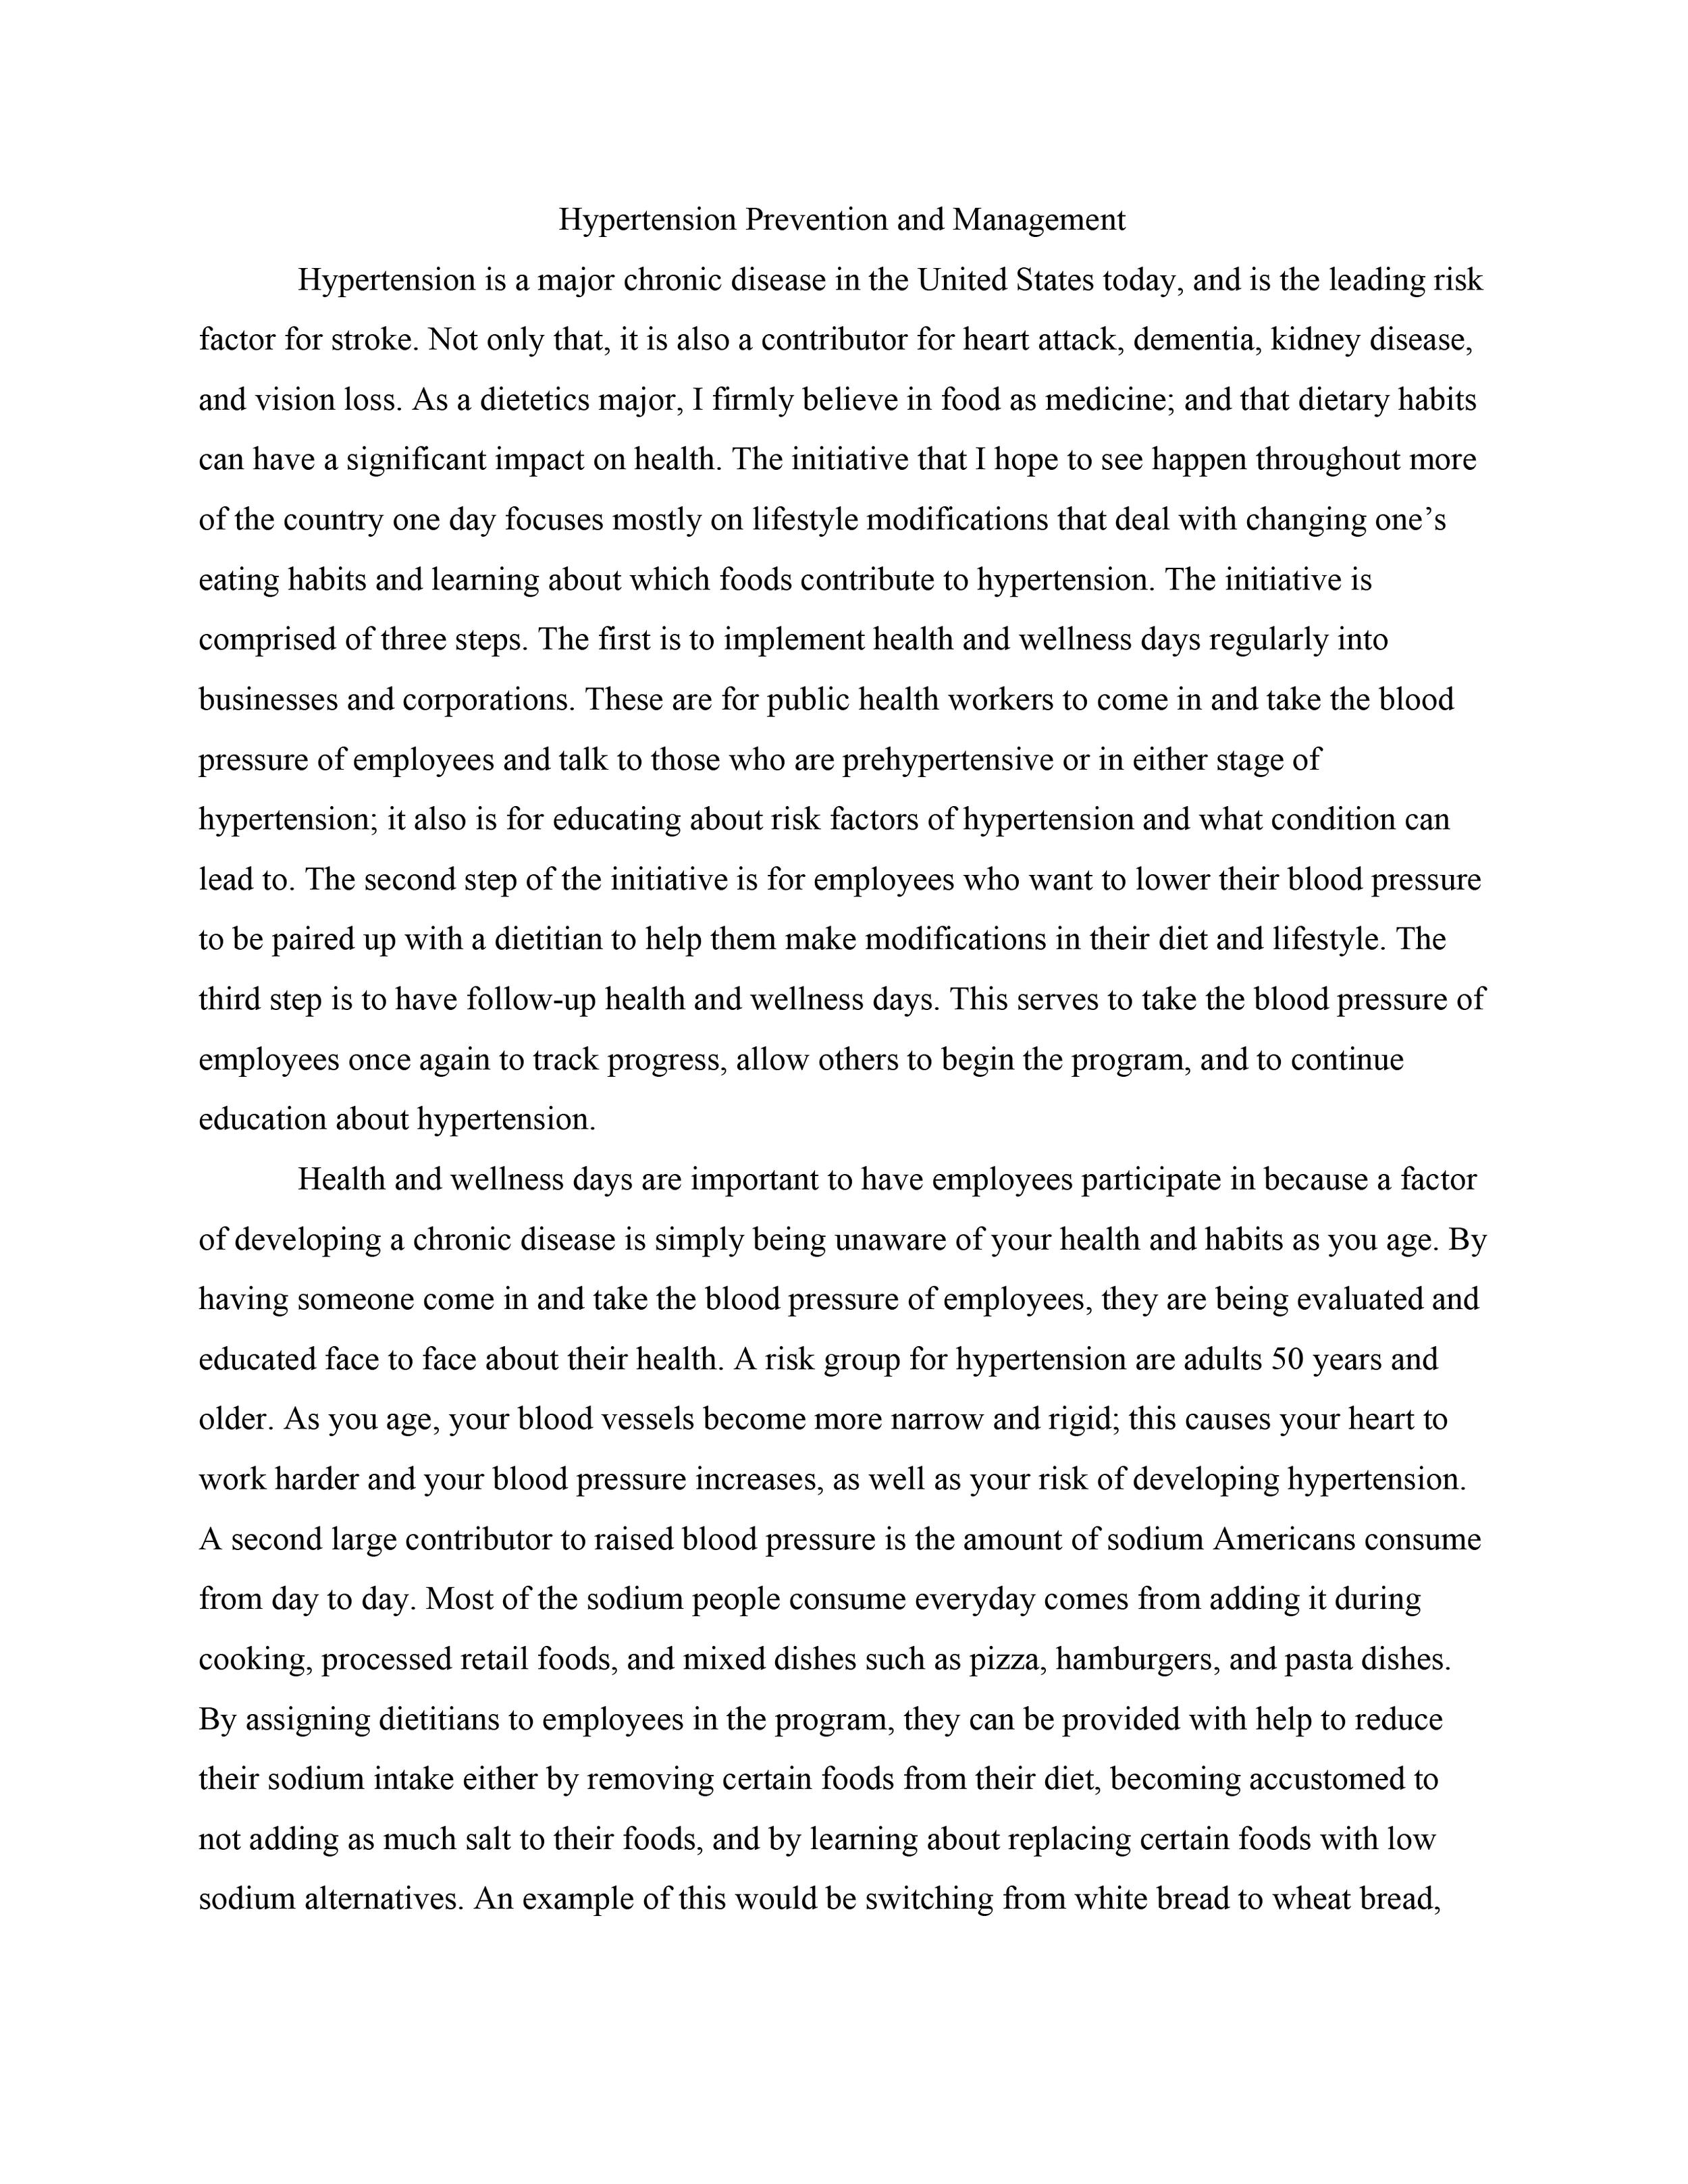 Natalie Olrich Essay, Page 1